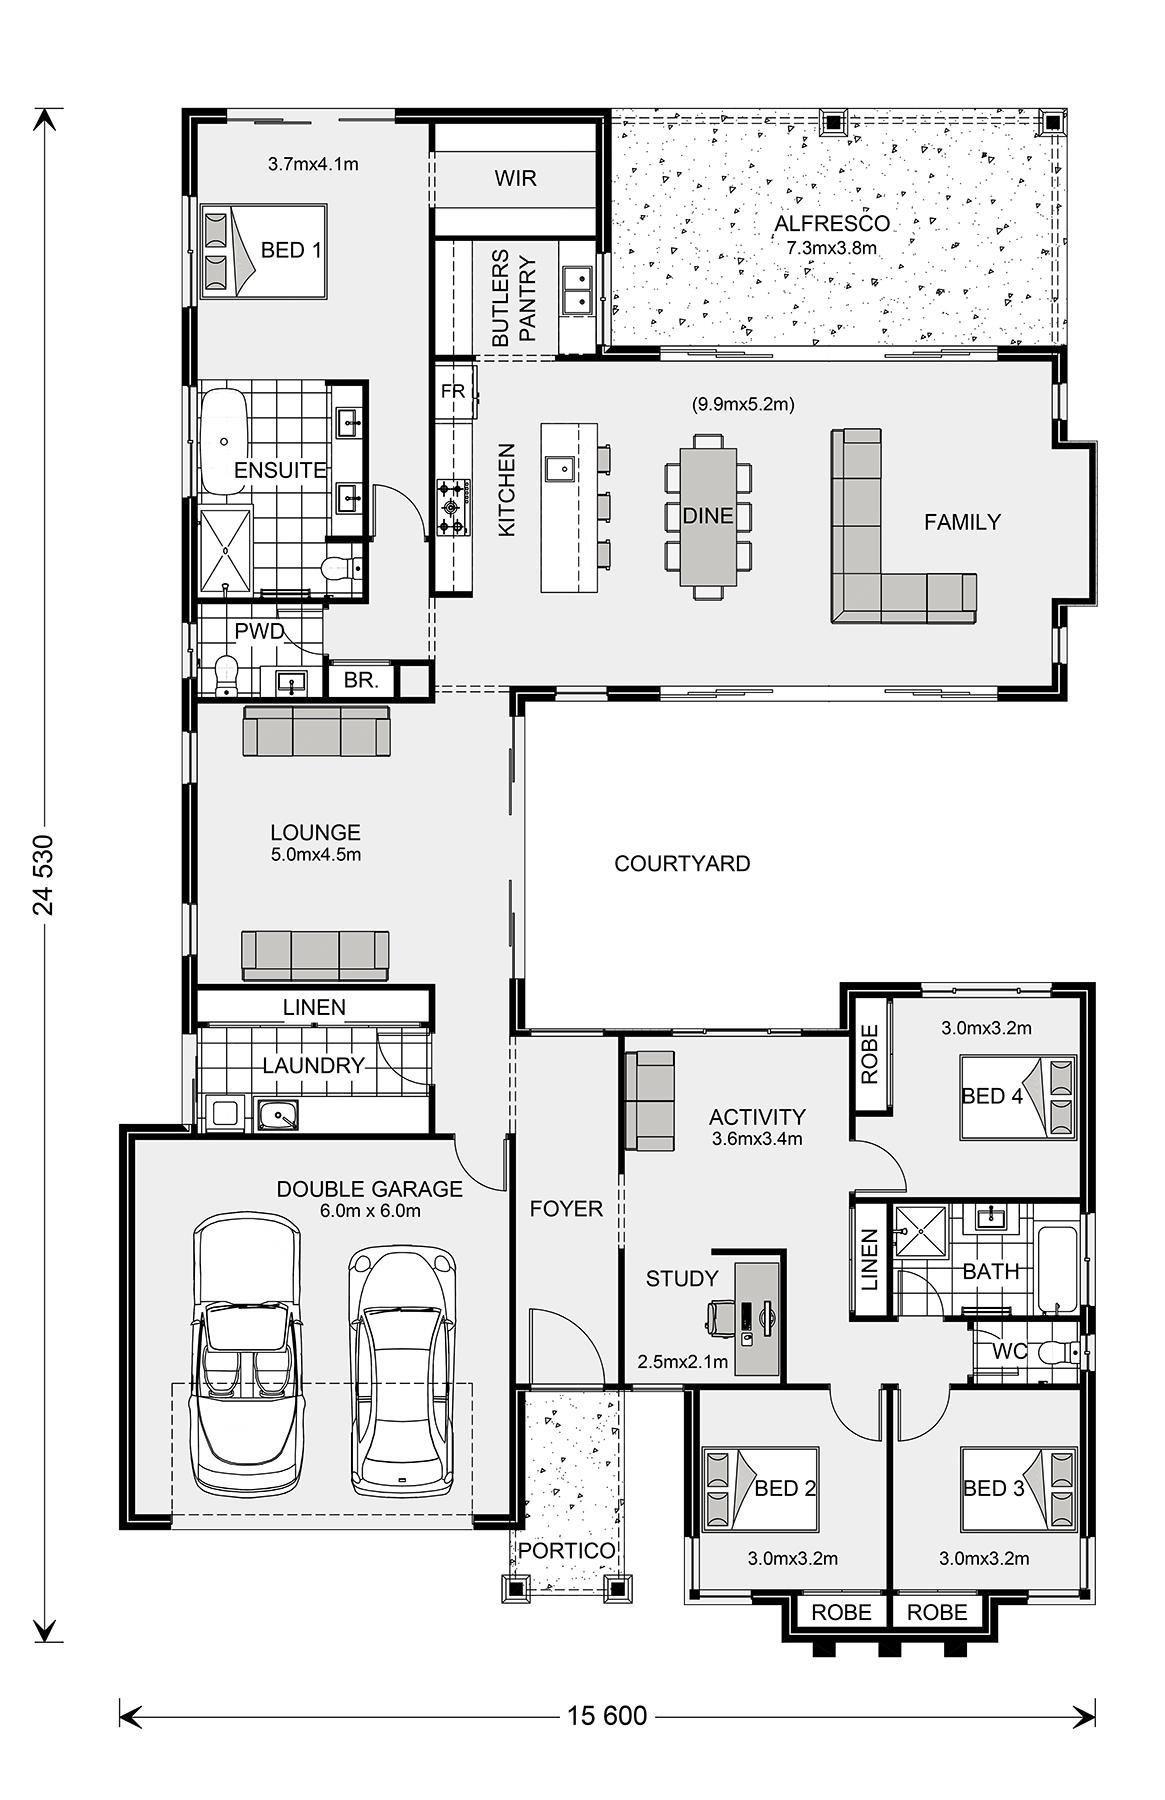 House Plans For Building 2021 Home Design Floor Plans U Shaped House Plans Dream House Plans